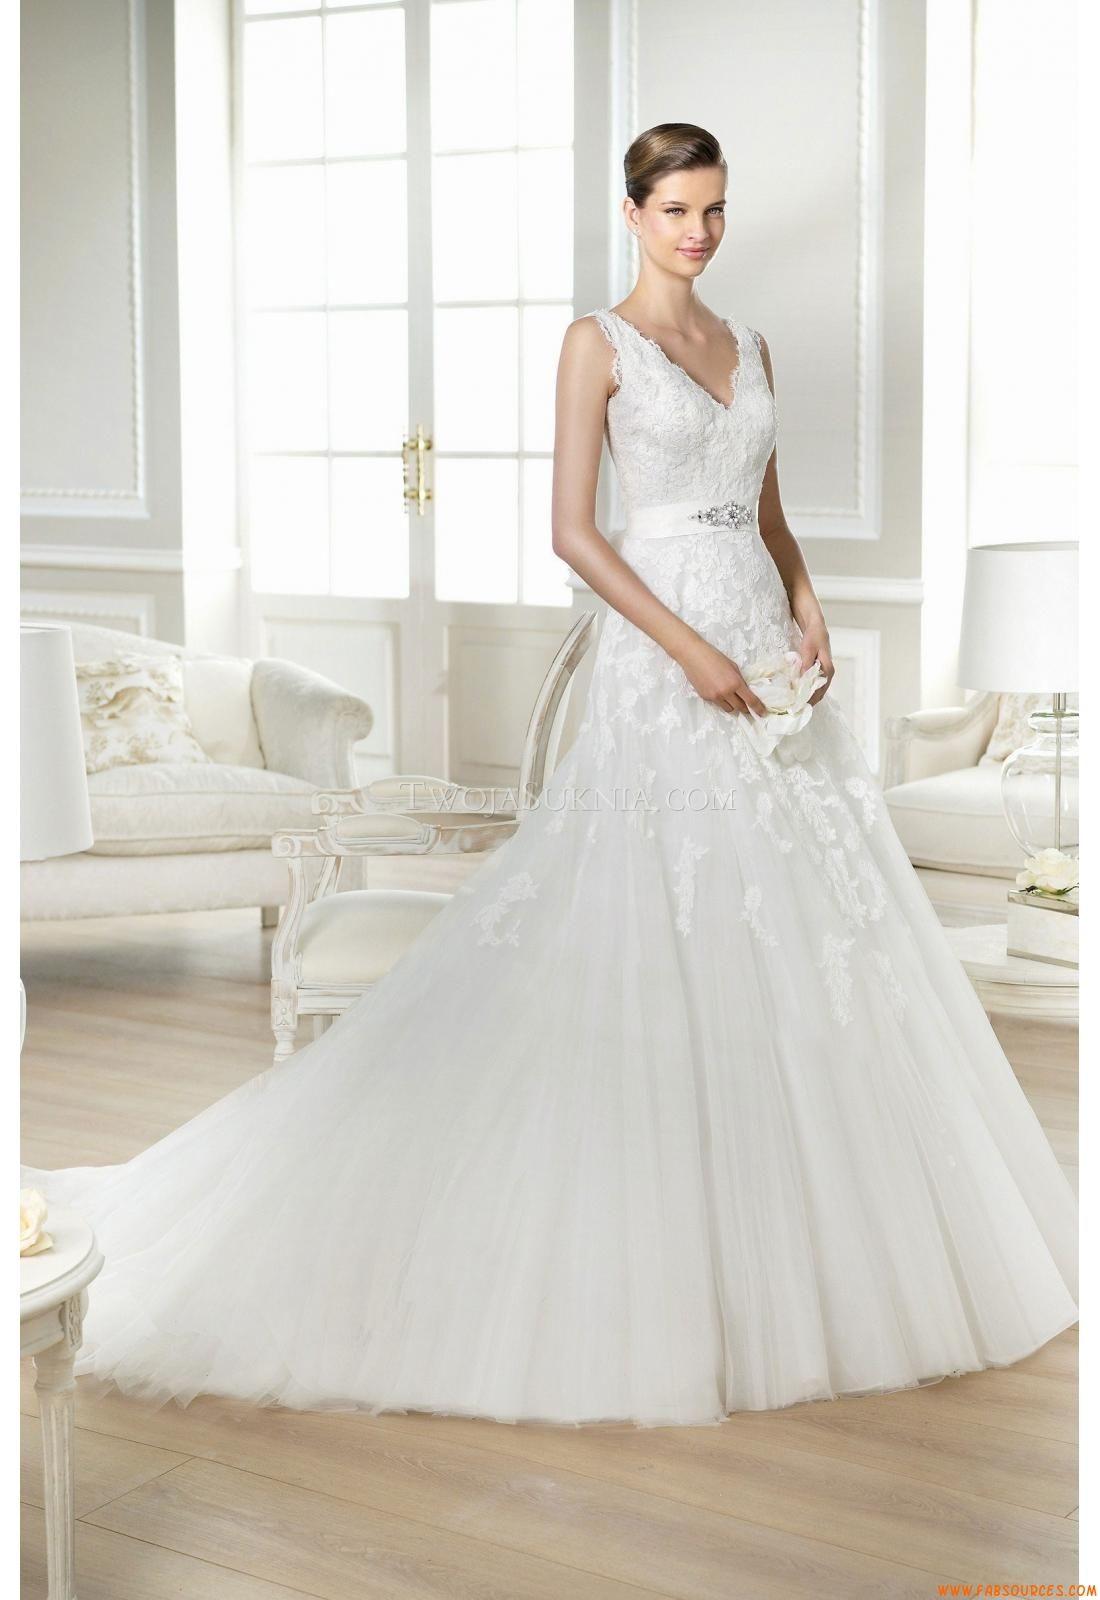 Robes de mariée White One Jaida 2014